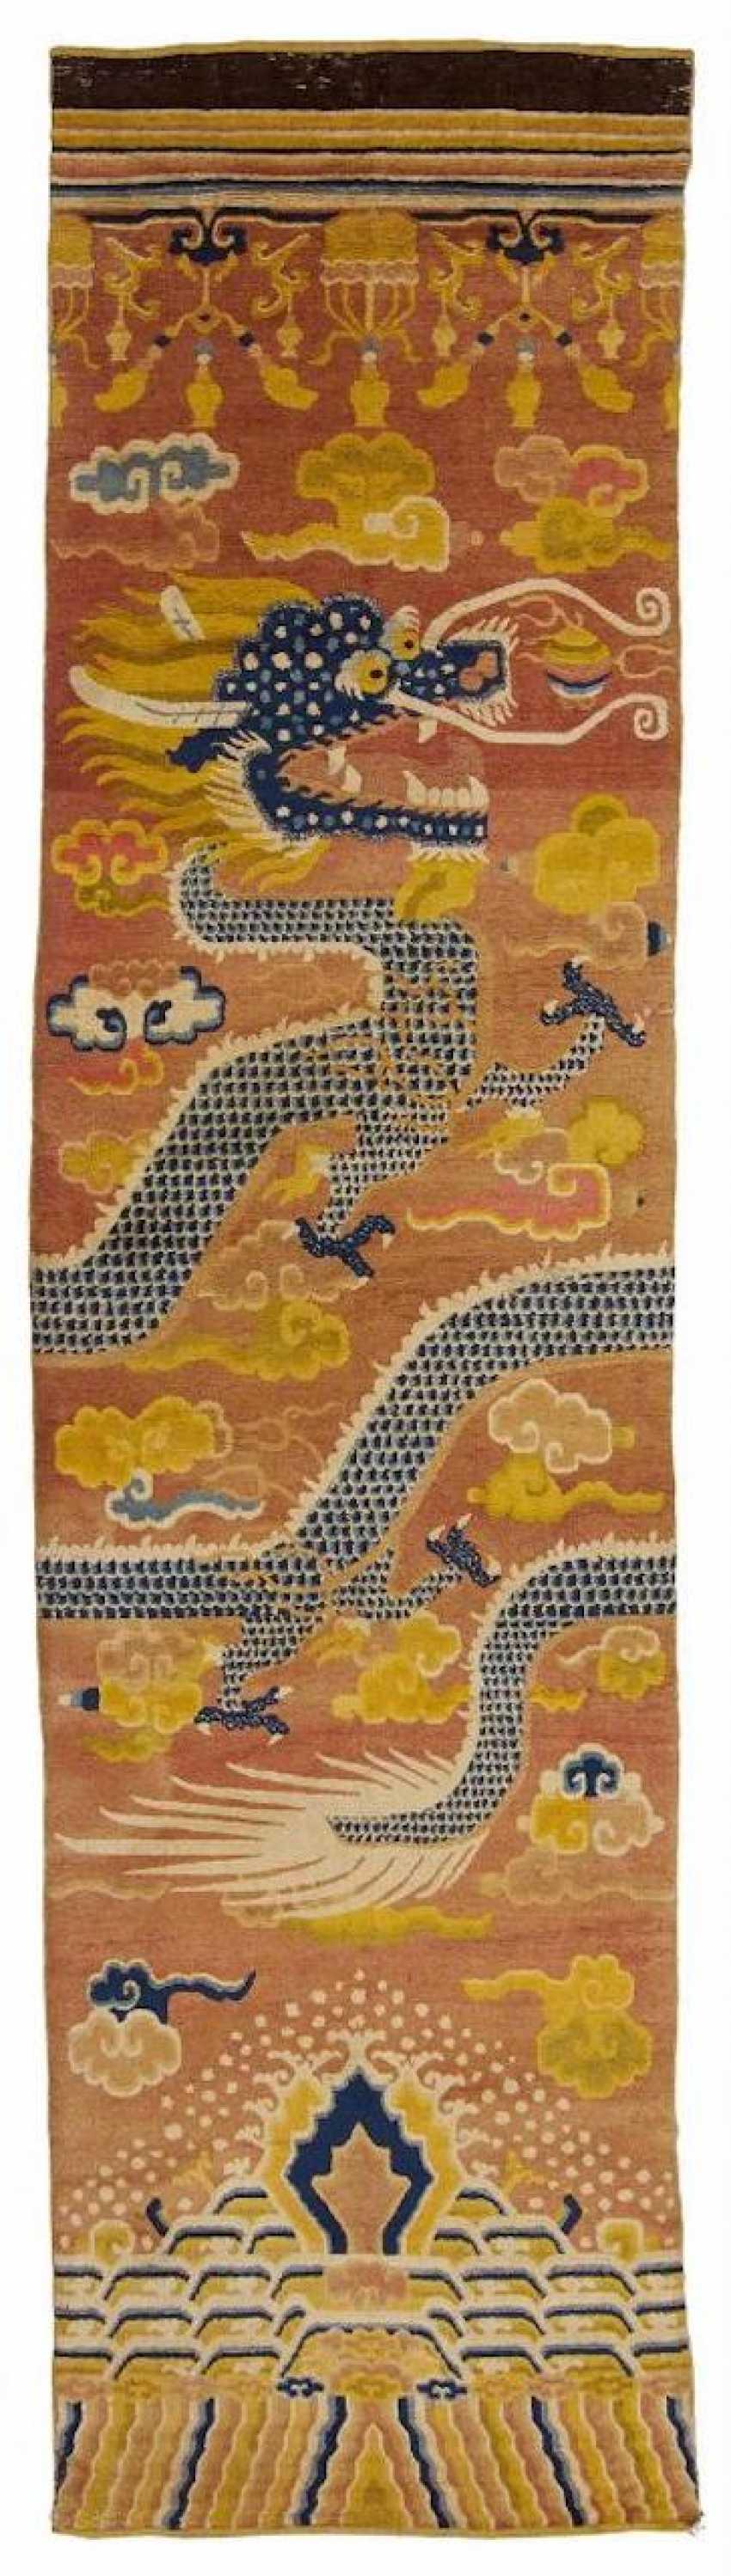 Rare Pair of pillar carpets with dragons - photo 2